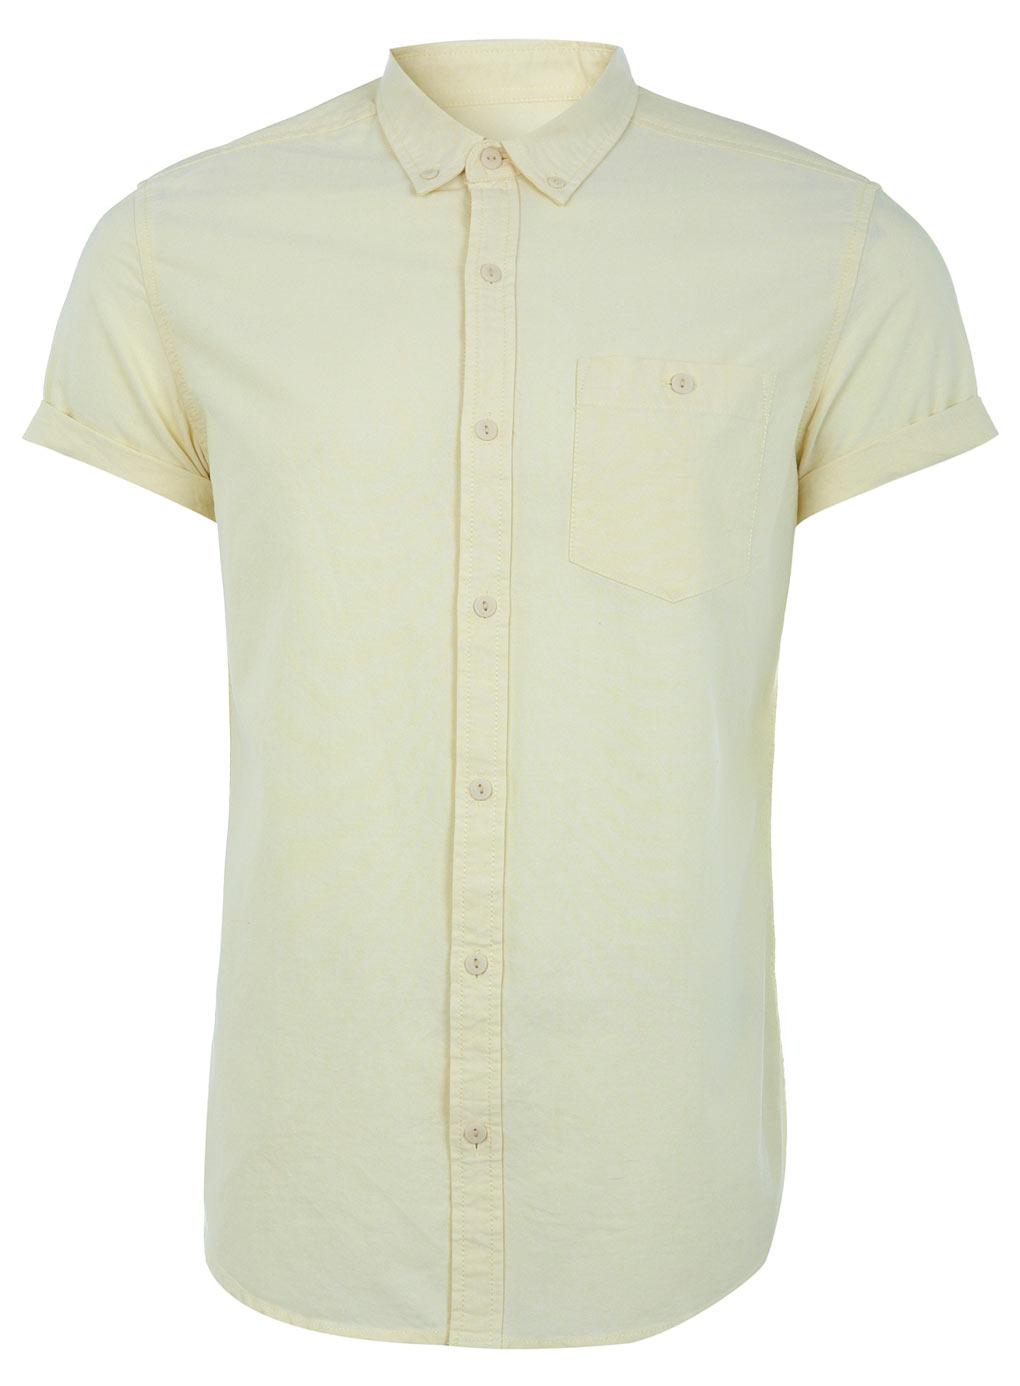 Burton shirts for men 2013